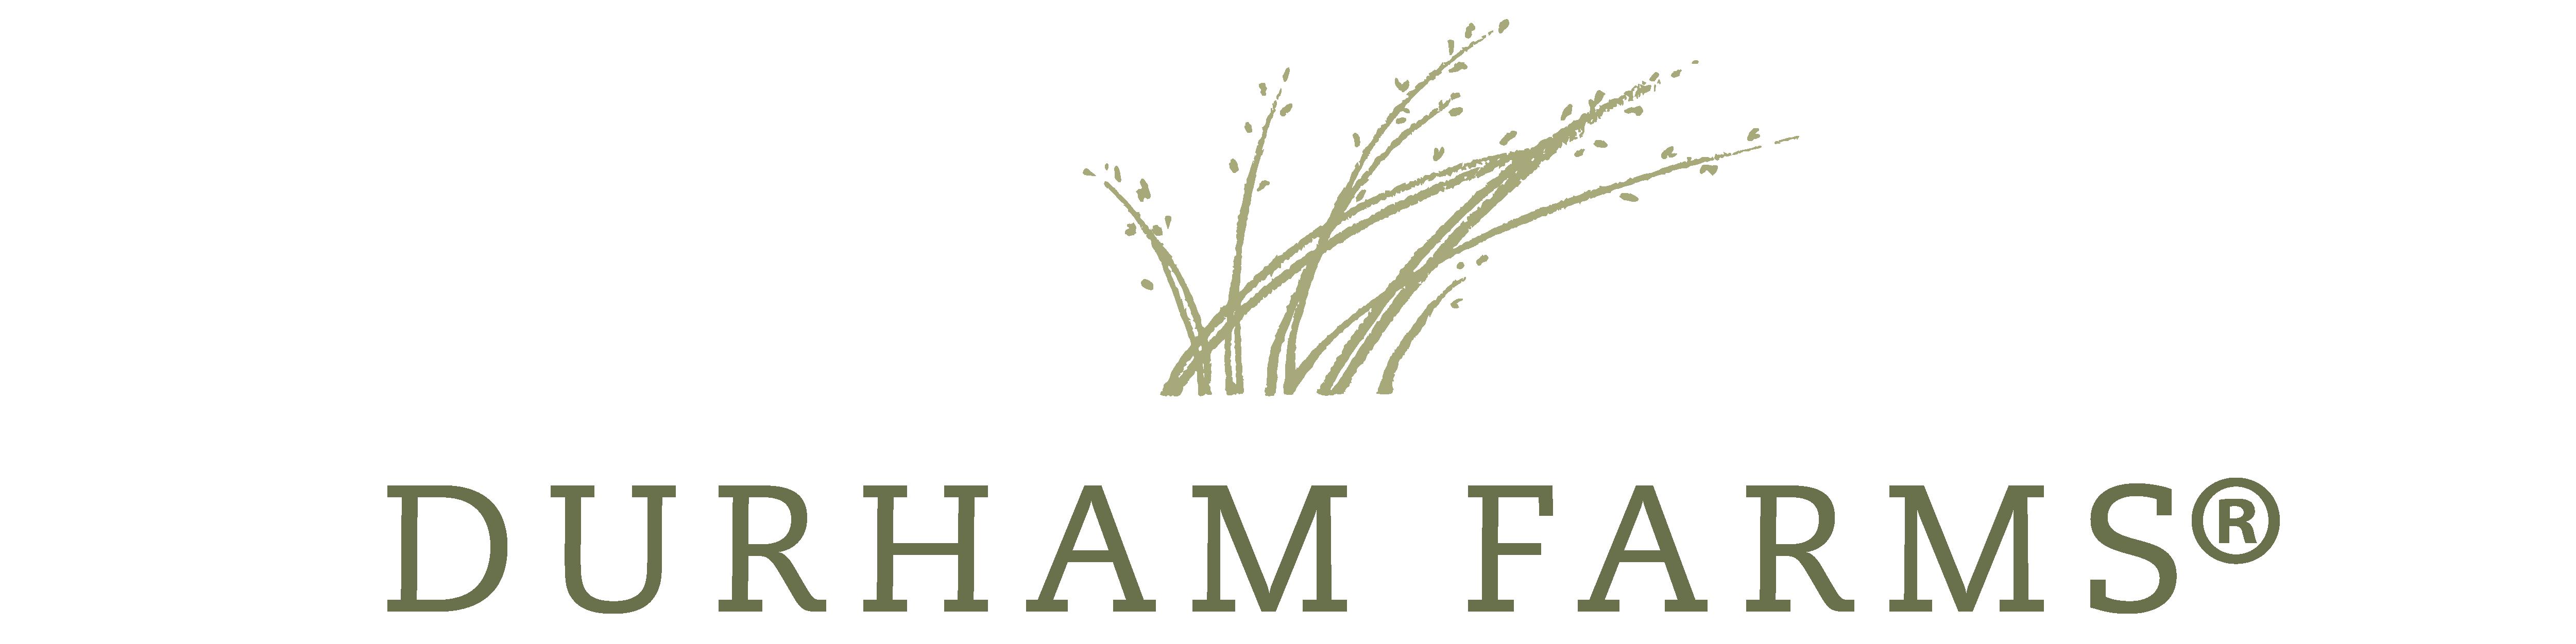 Durham Farms 2020 updated_DurhamFarms_1200x300